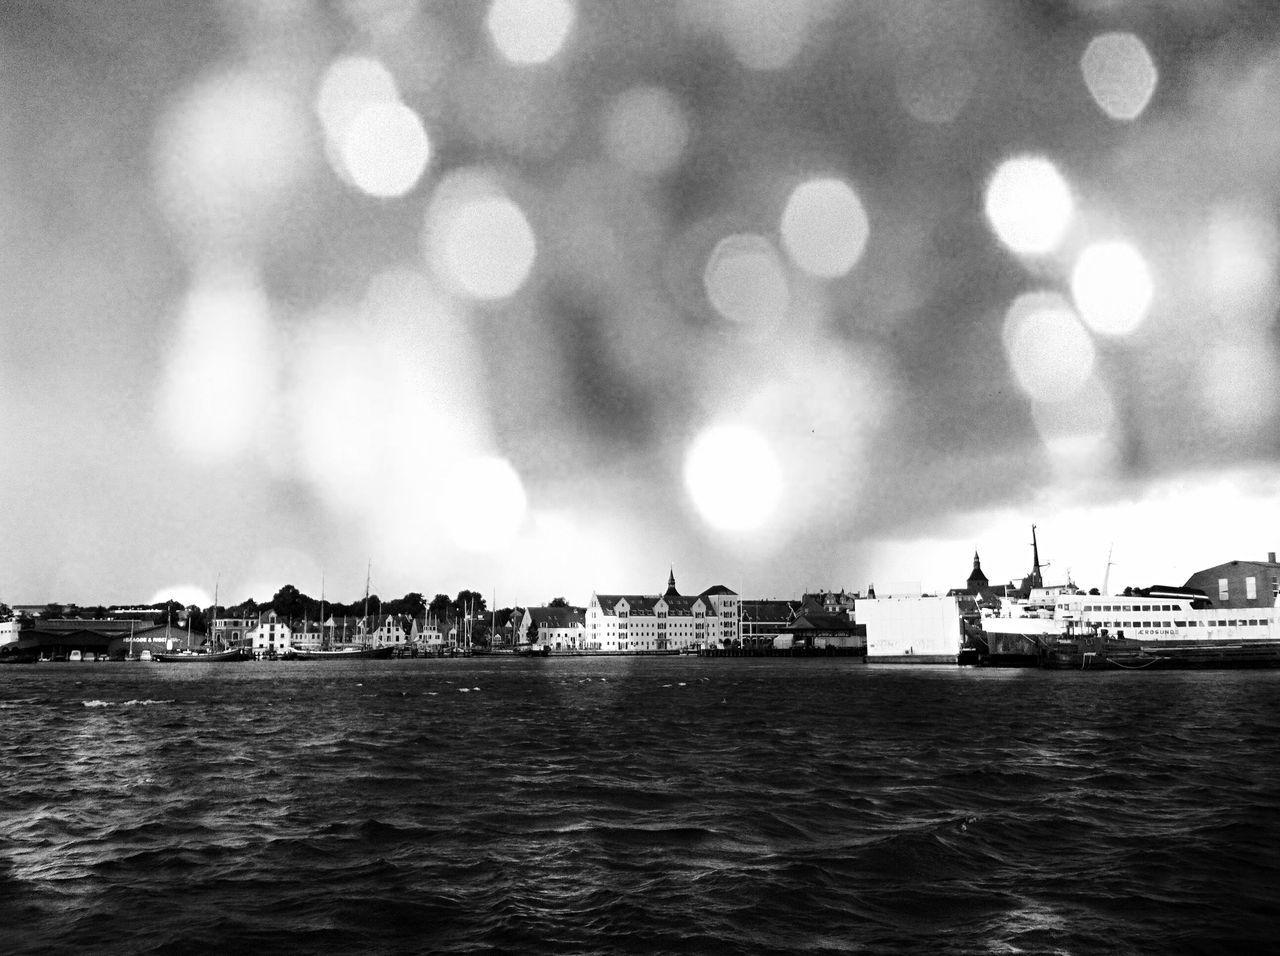 Raindrops Stormy Weather Shipping  Cityscapes Baltic Sea Danmark Svendborg Adventure